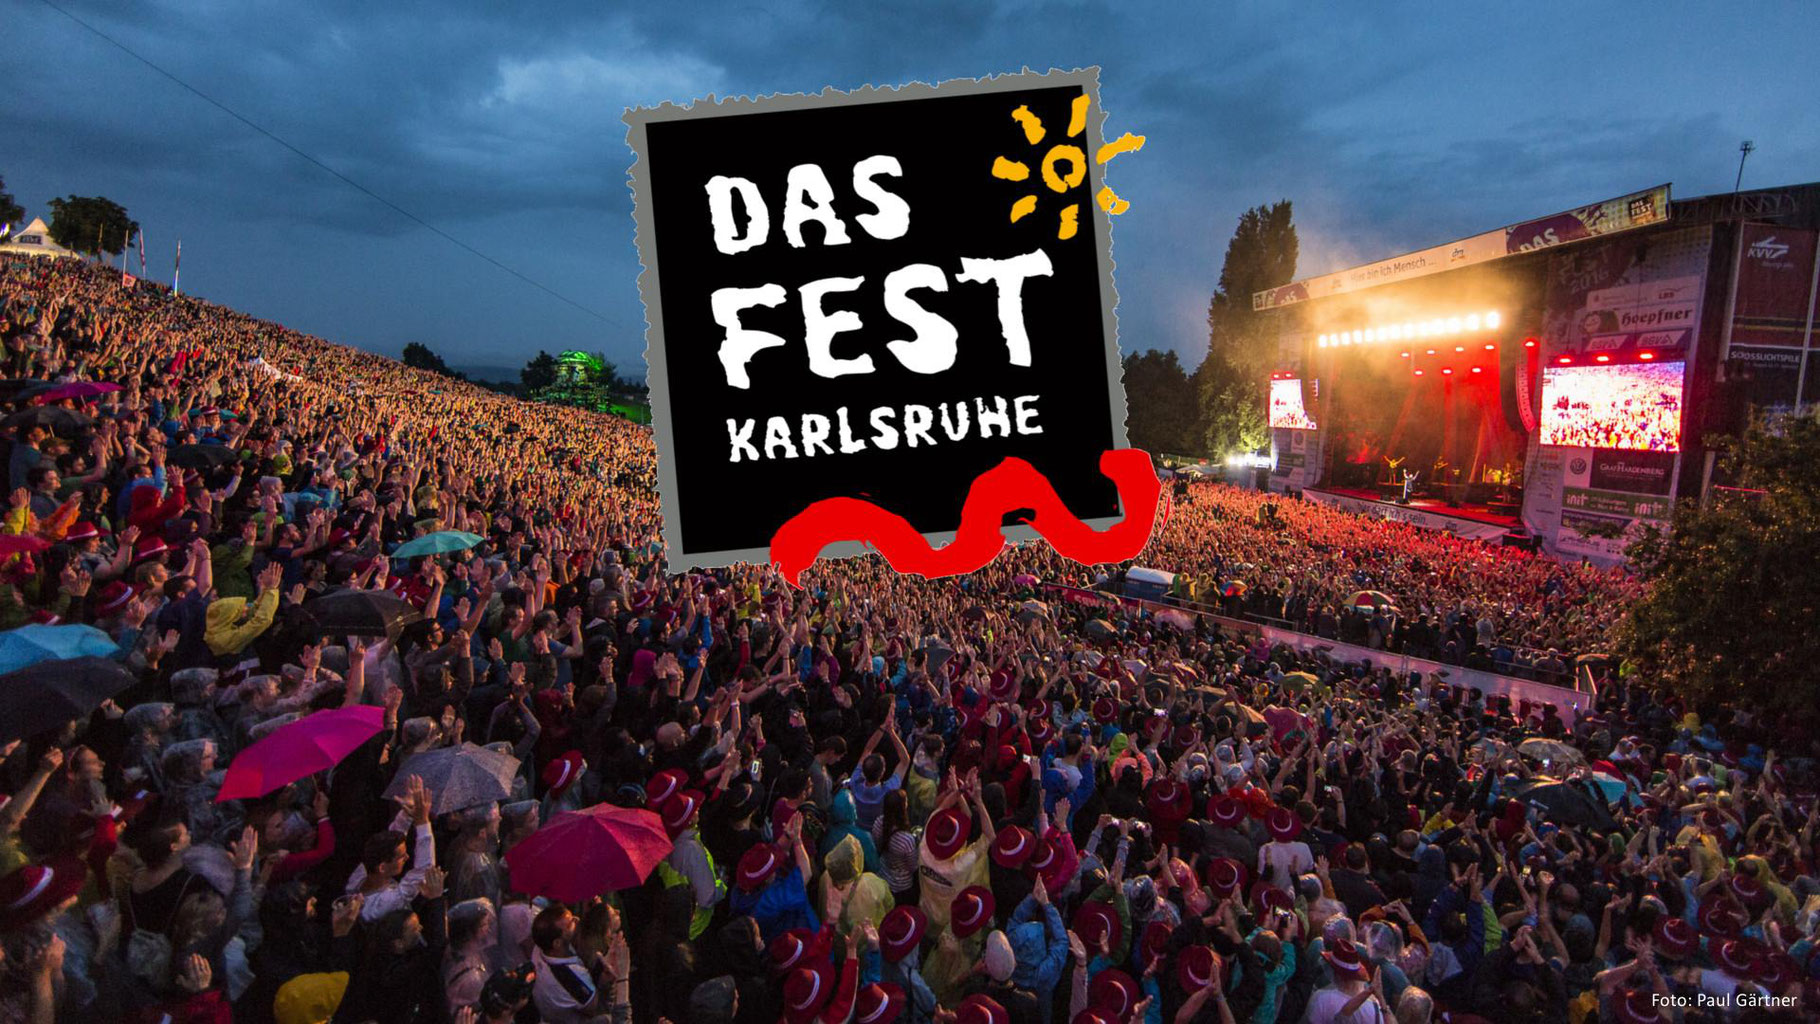 Karlsruhe Das Fest 2021